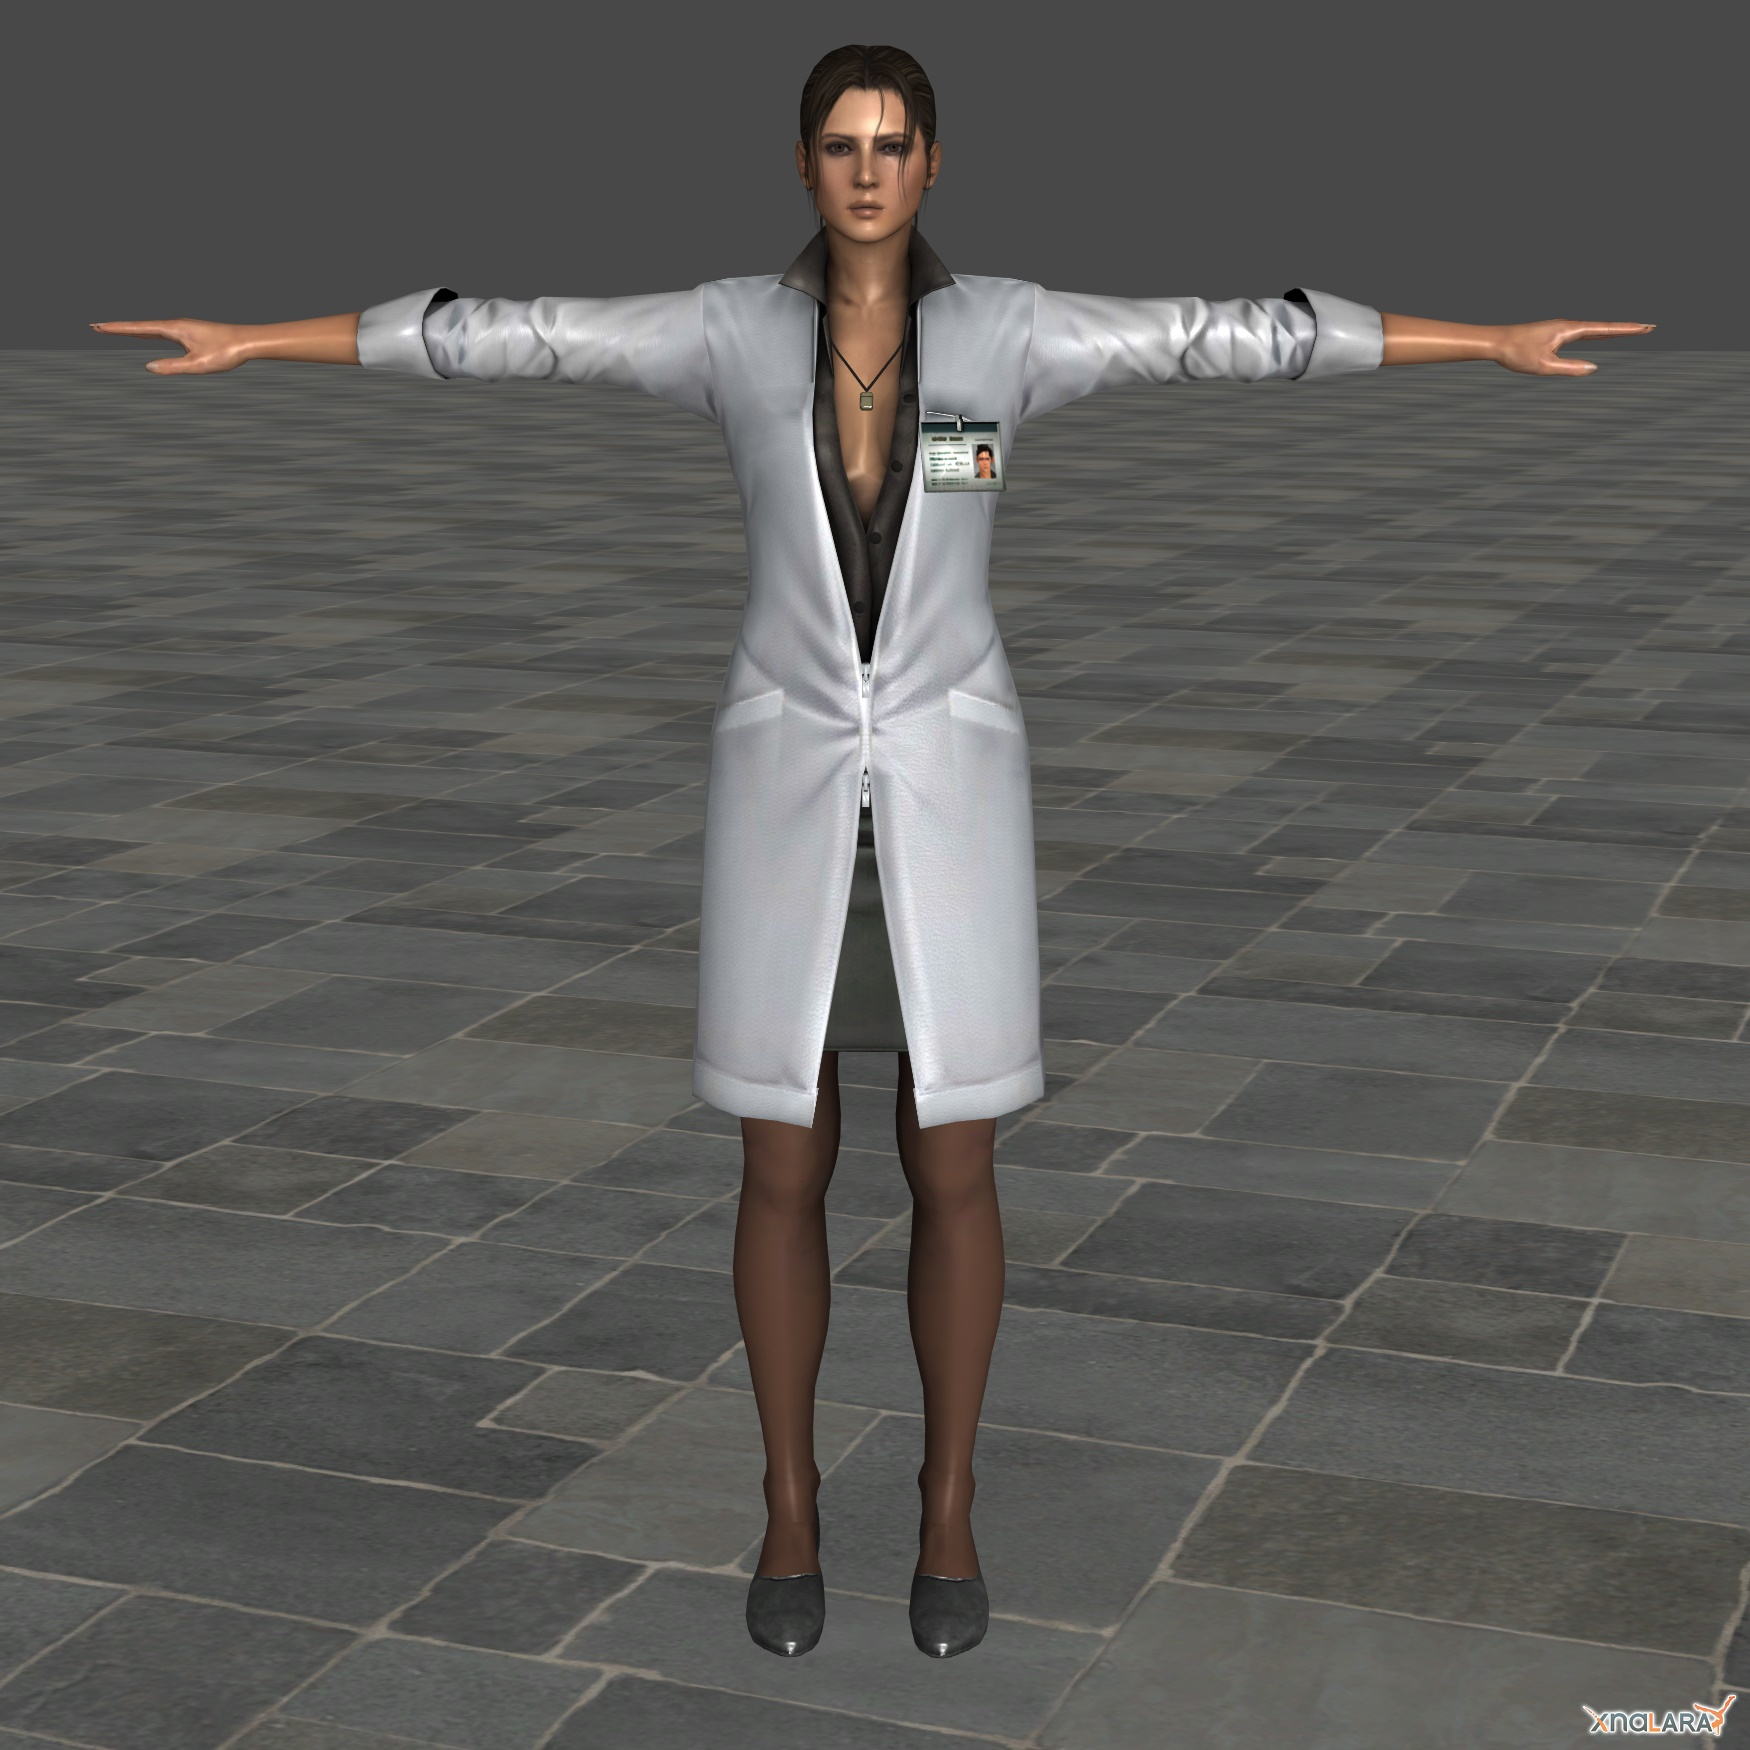 Metal Gear Solid 4 3d Models Free